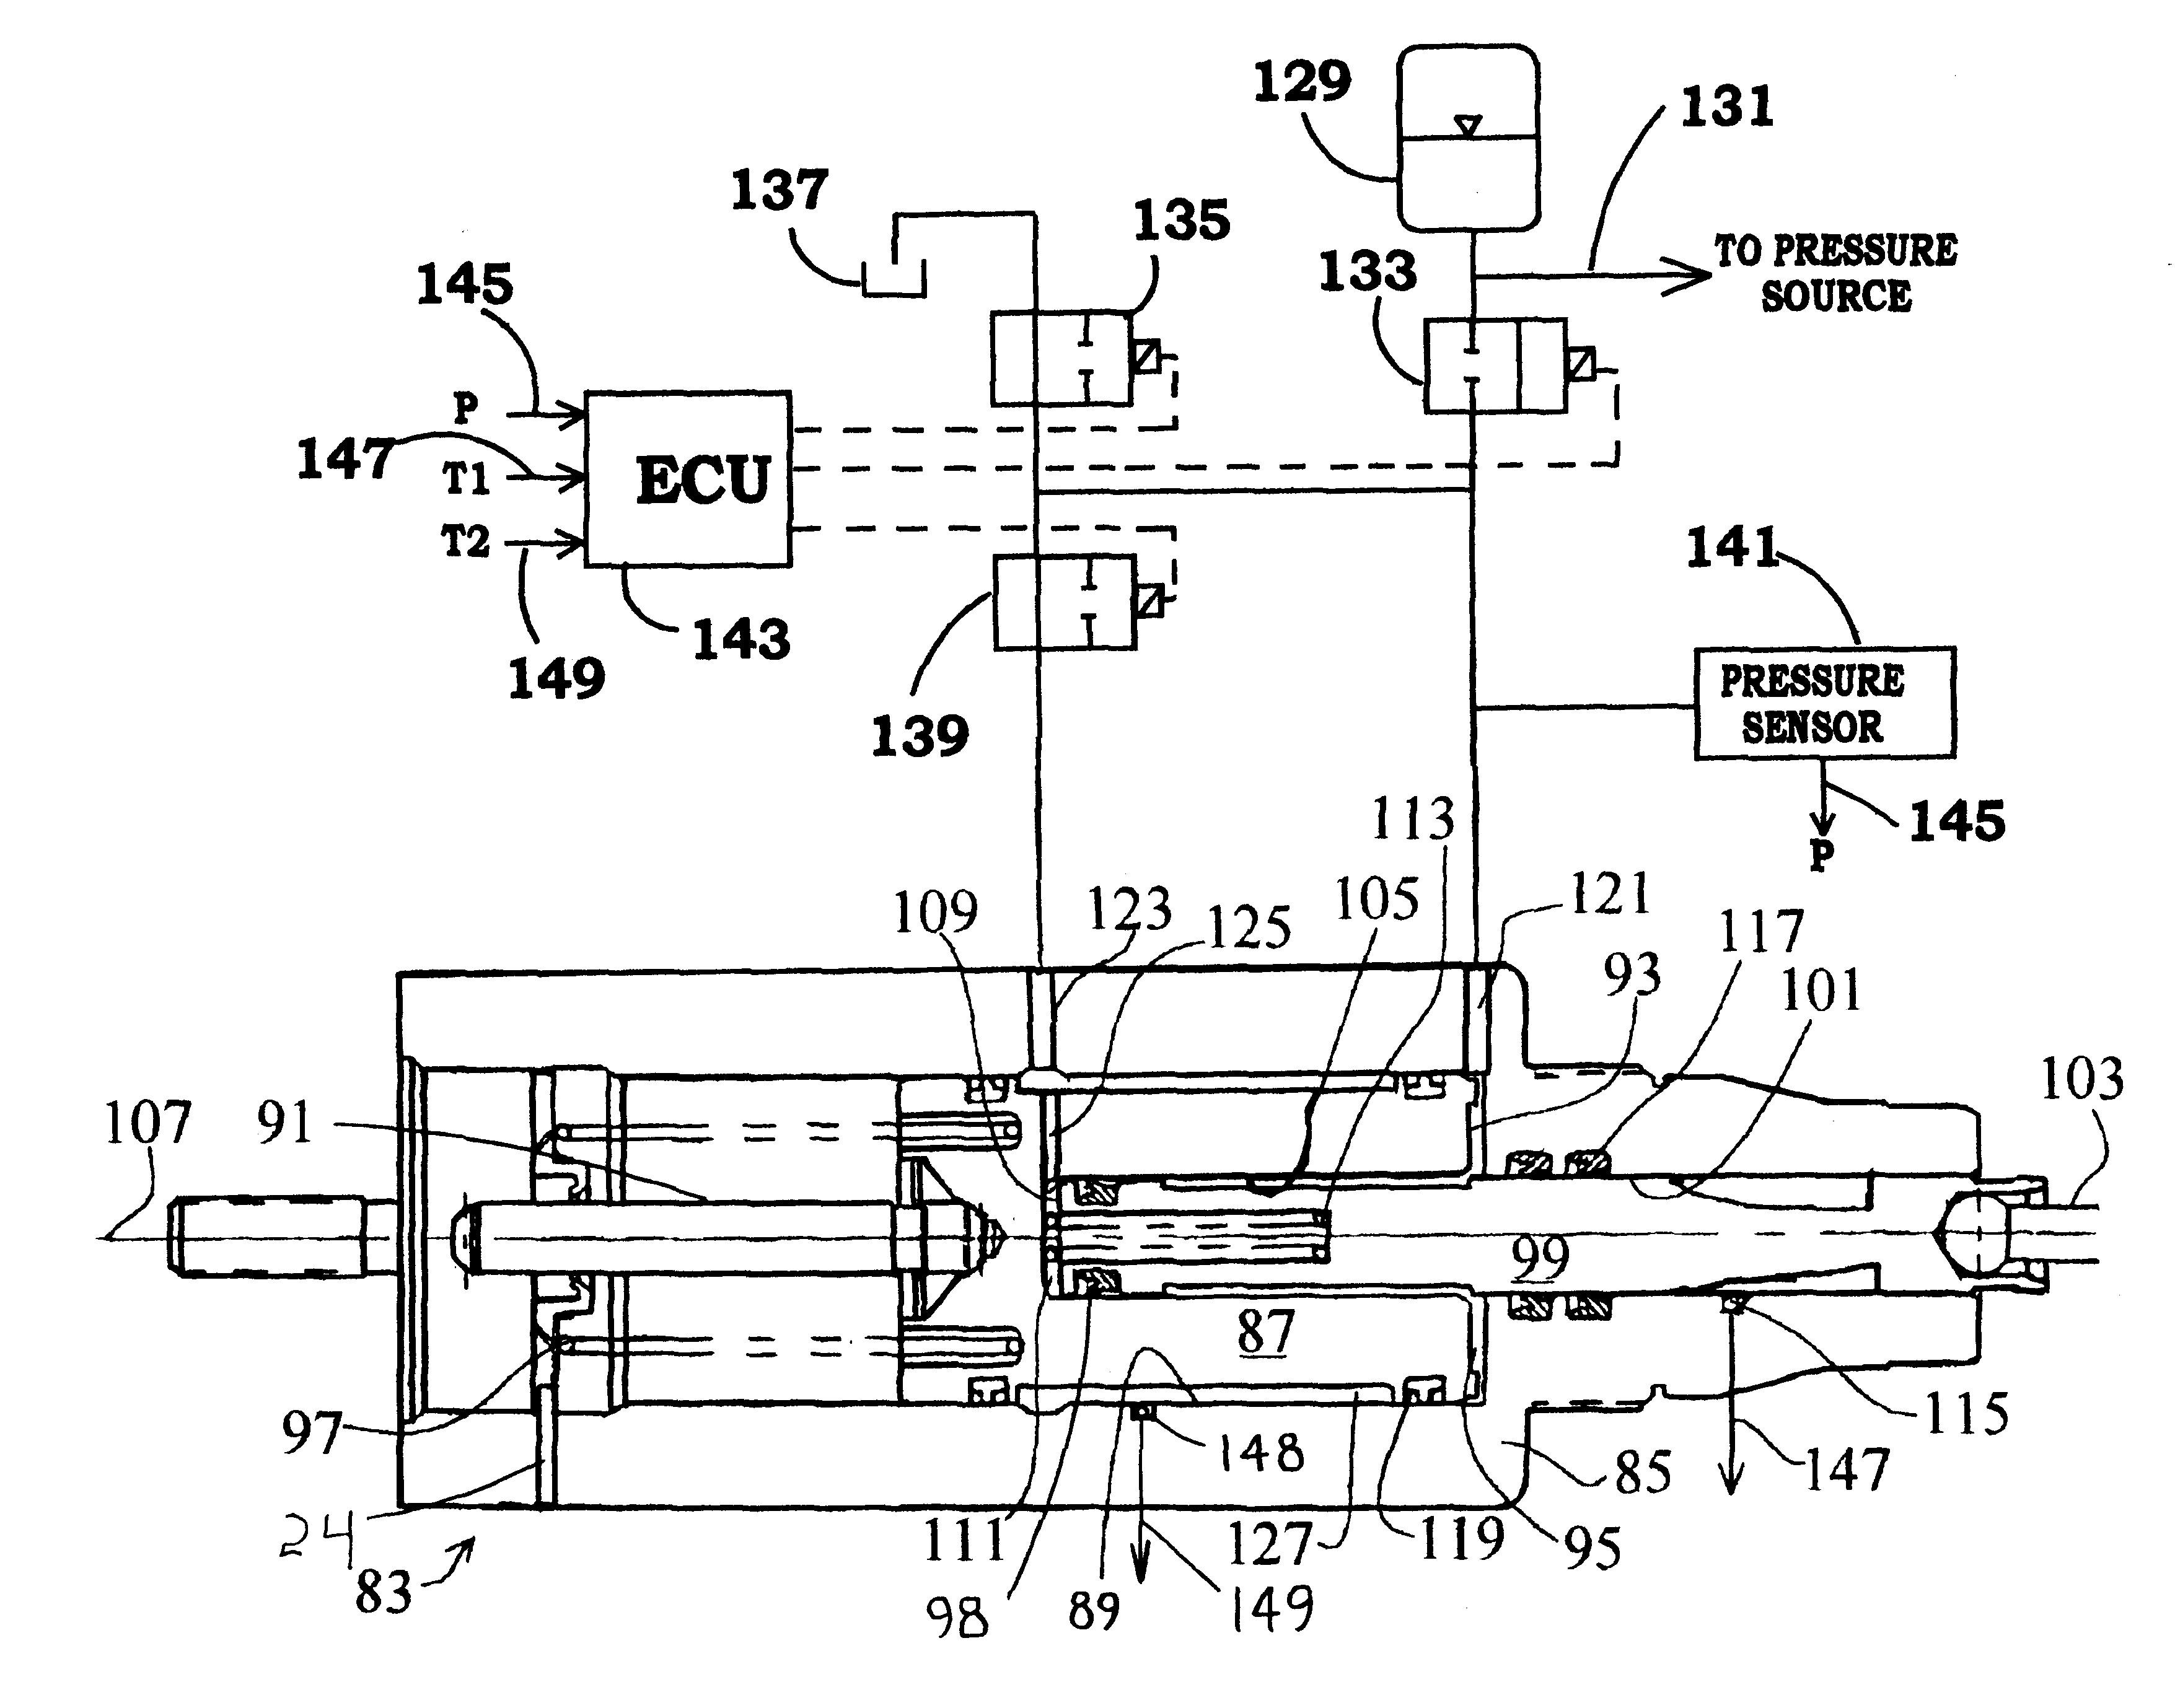 Brake Booster Diagram Hydraulic Brake Booster Of Brake Booster Diagram